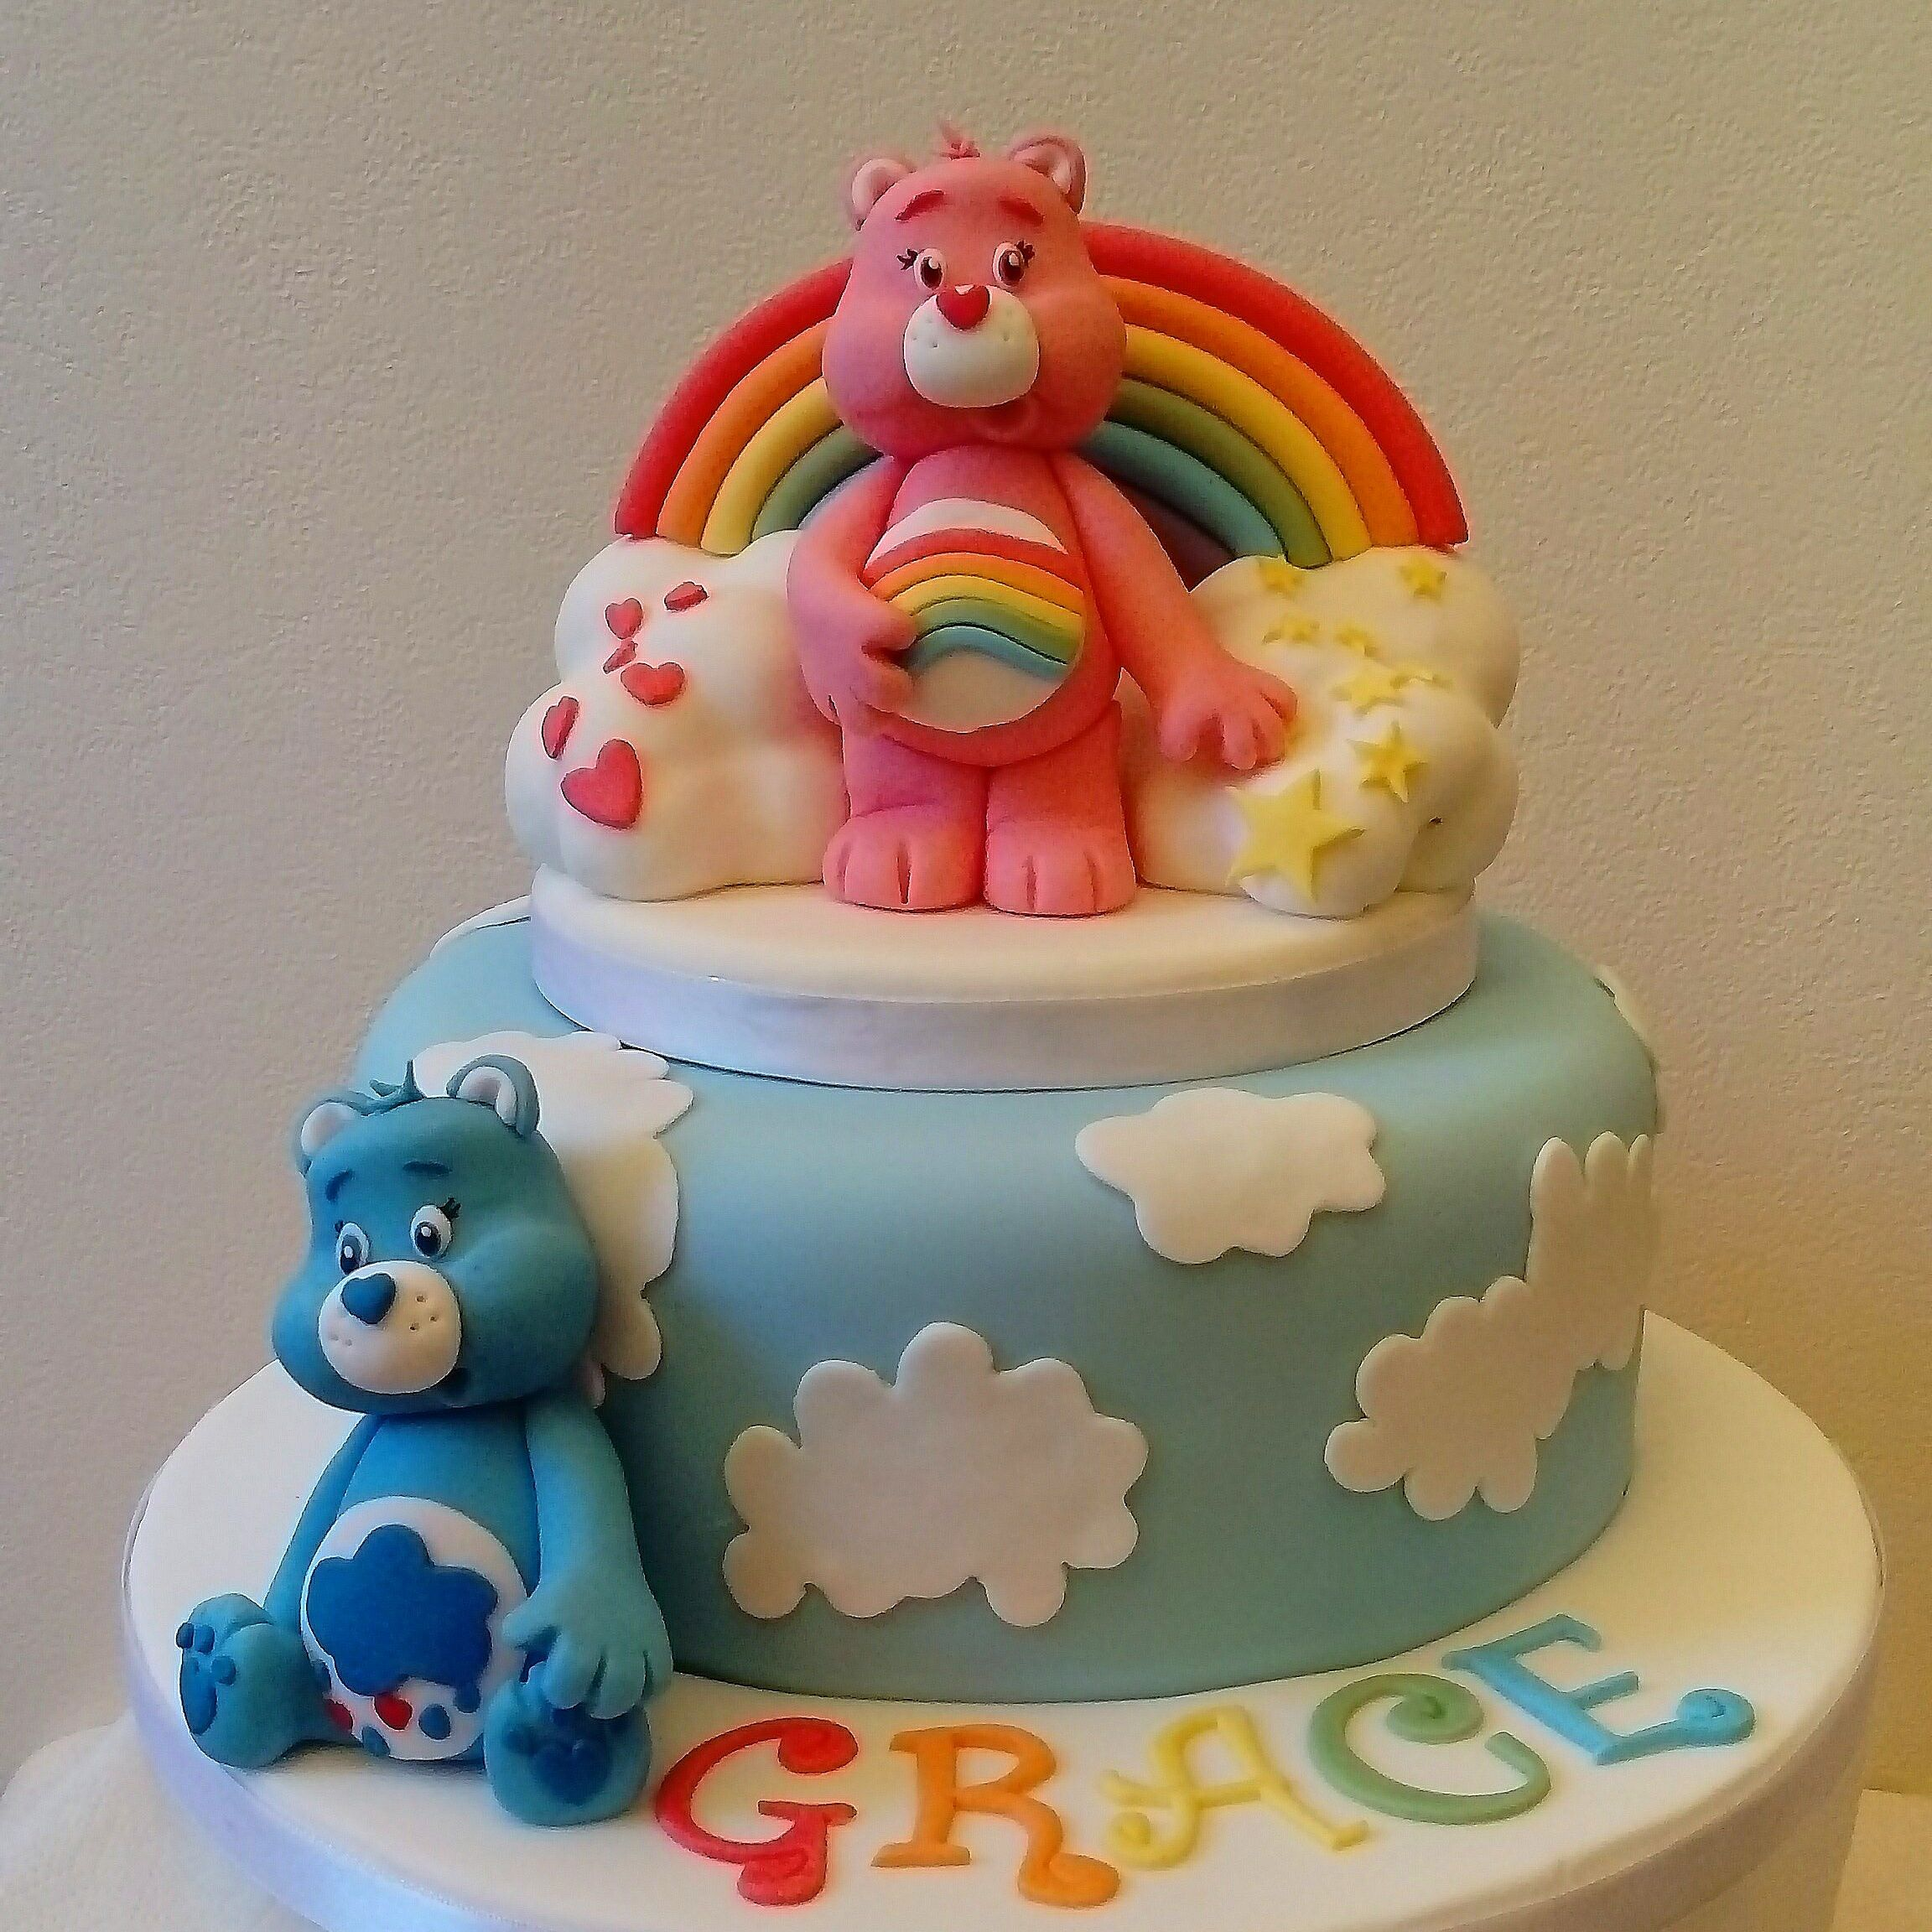 Astonishing Care Bears Birthday Cake Care Bear Cakes Birthday Party Cake Birthday Cards Printable Benkemecafe Filternl